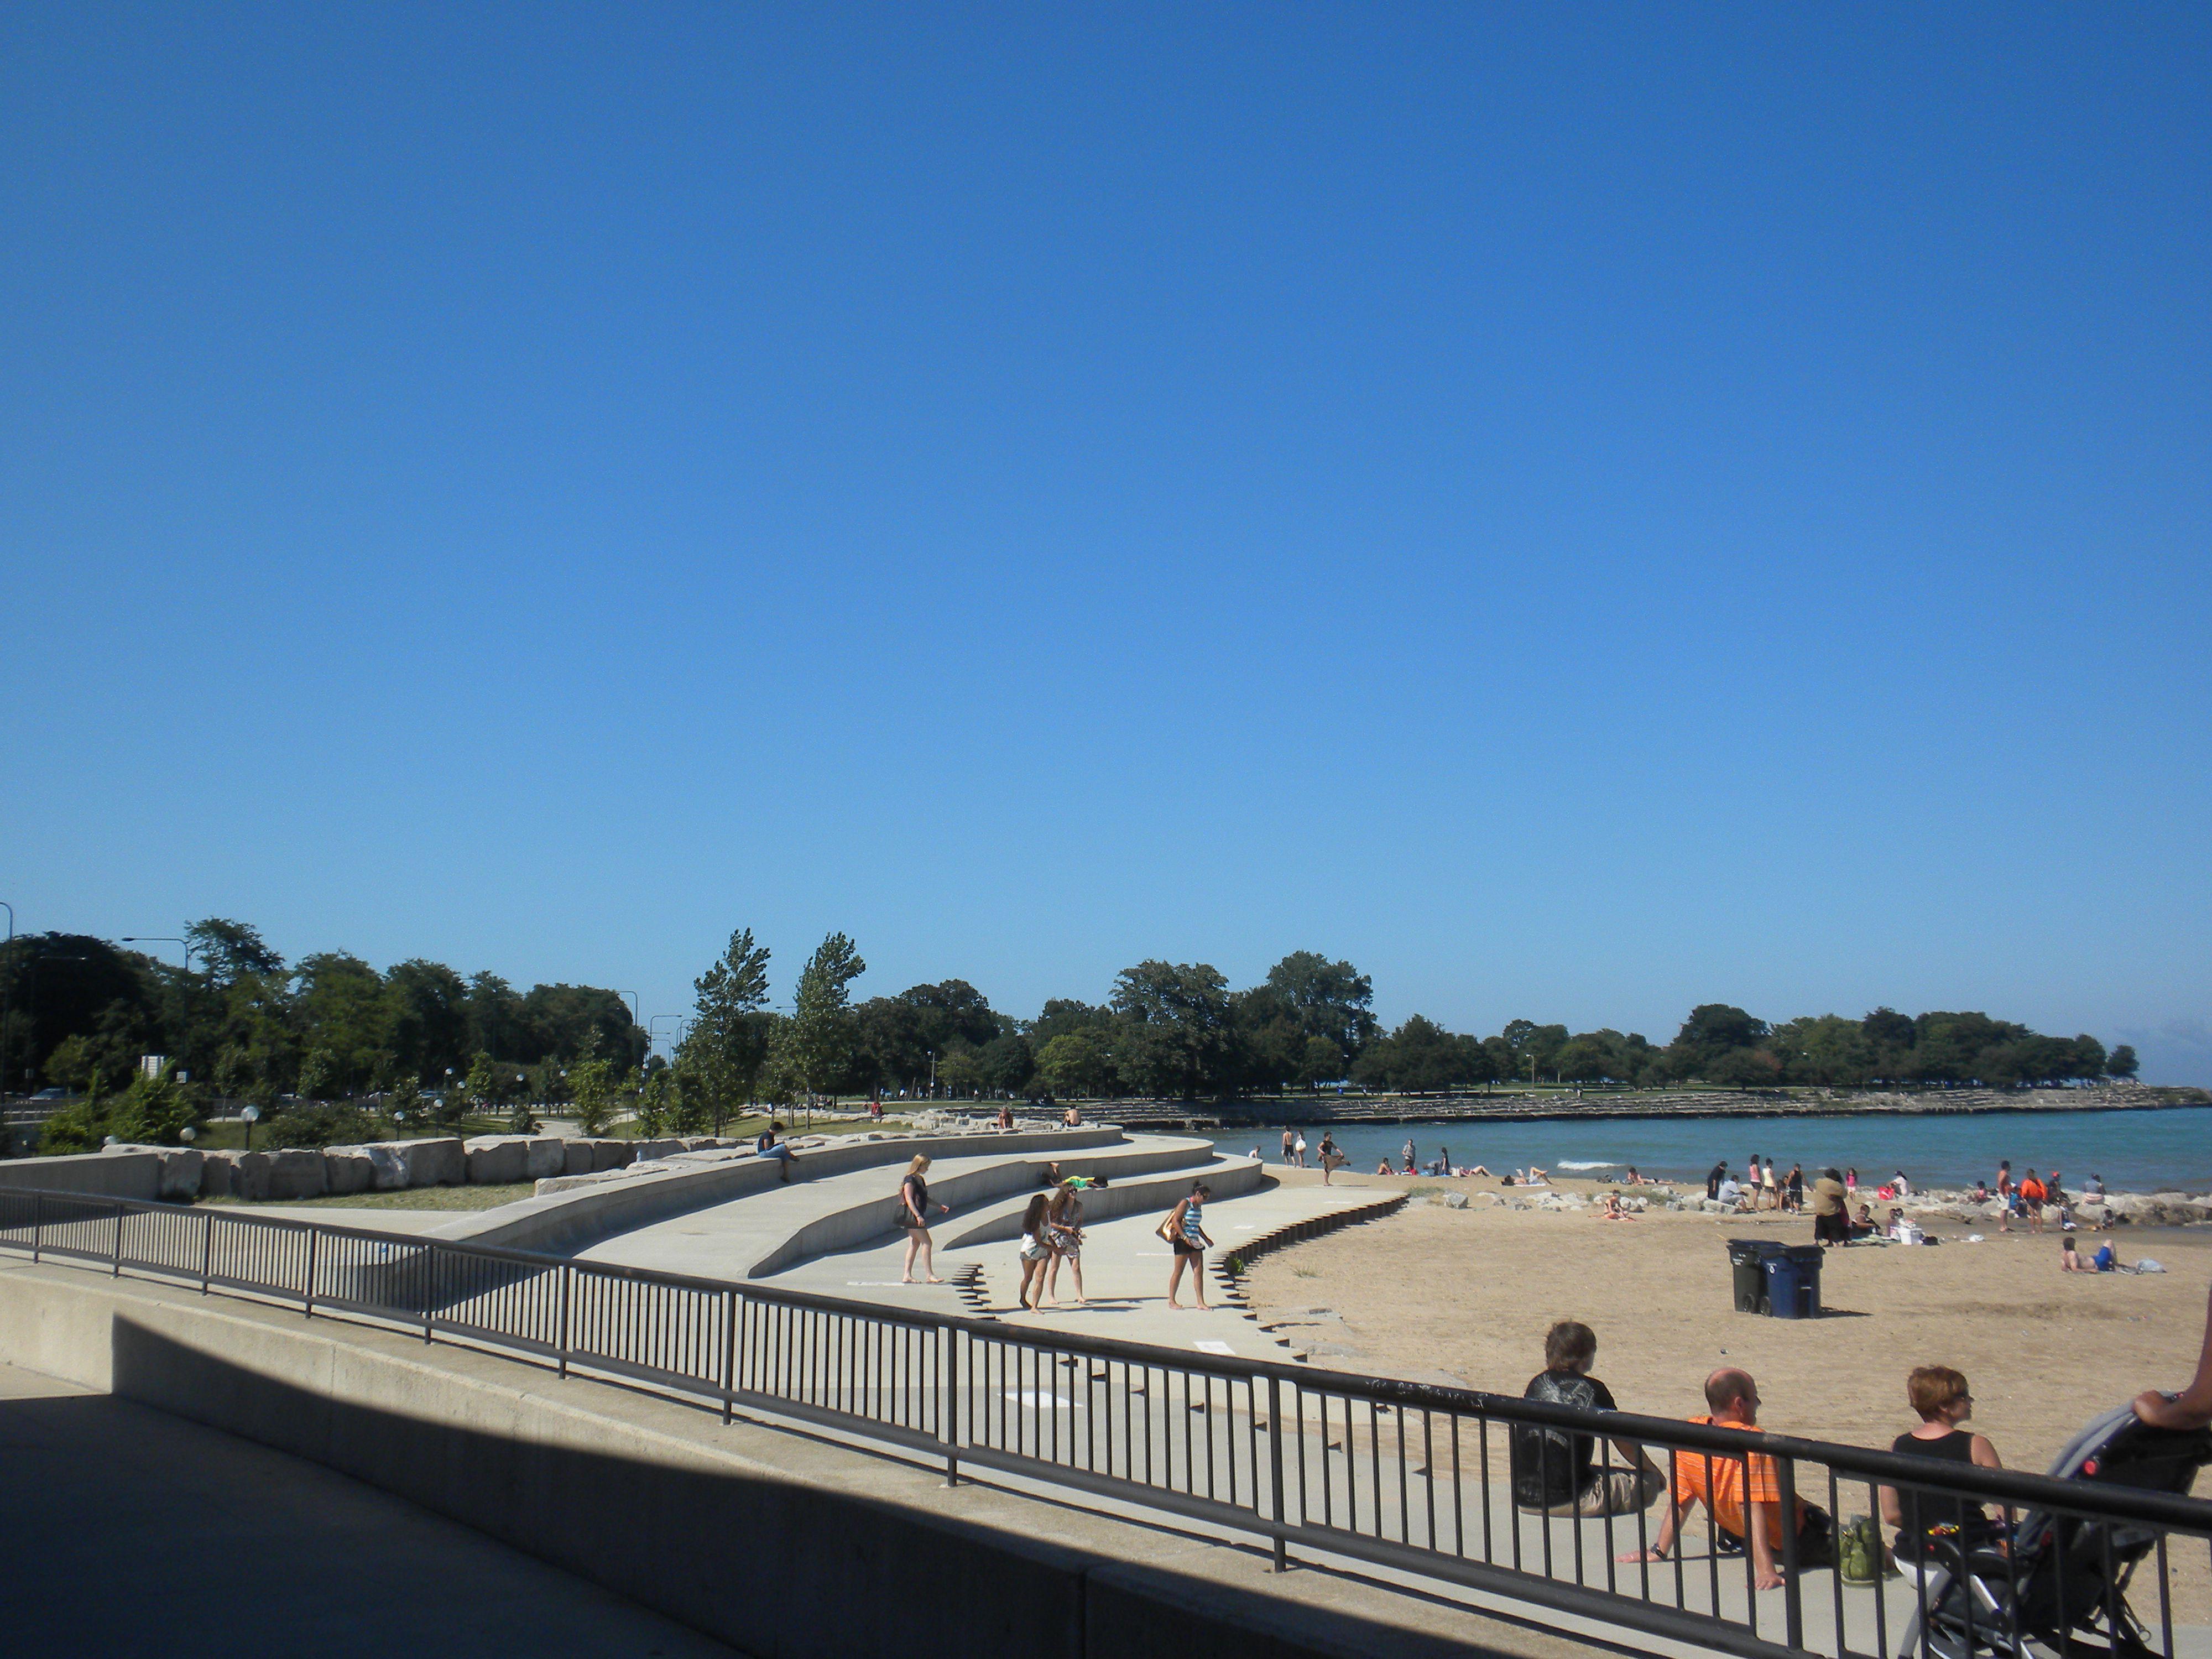 57th Street Beach Hyde Park, Chicago